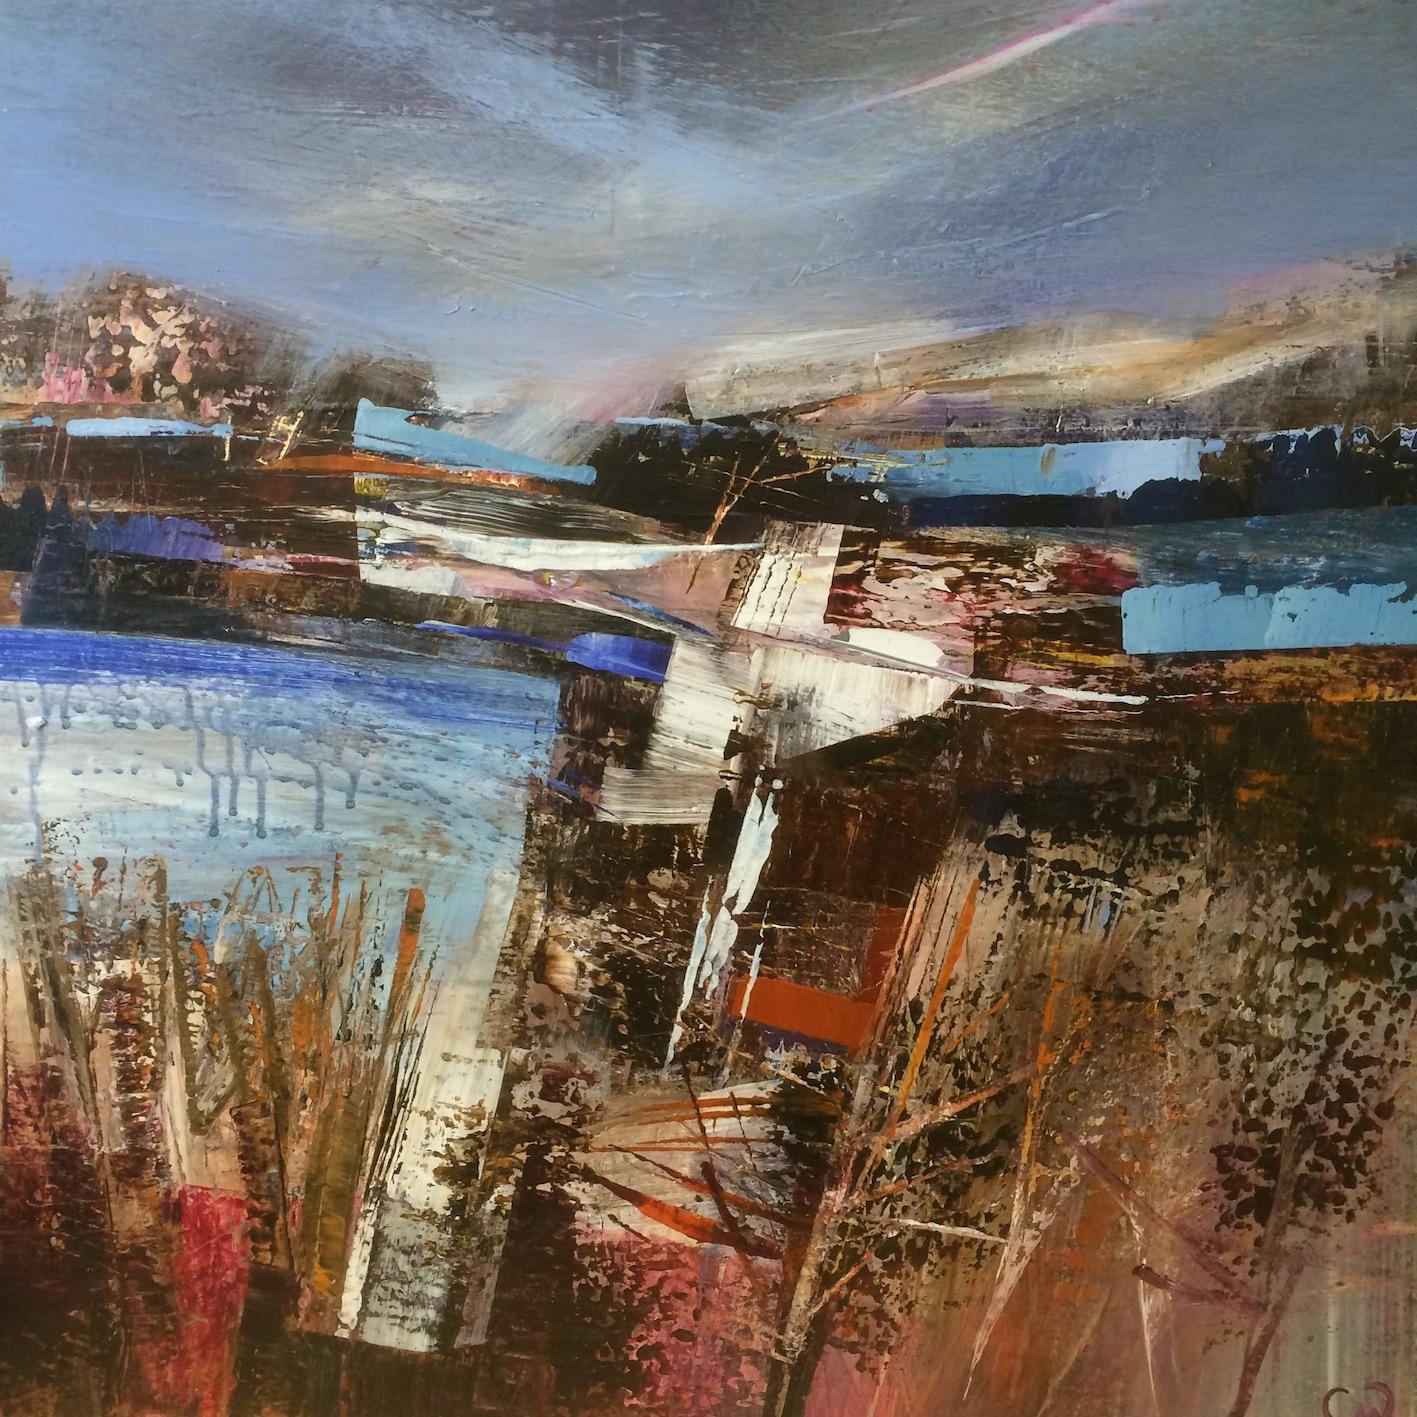 Unyielding Acrylic on canvas 80x80cm Celia Wilkinson